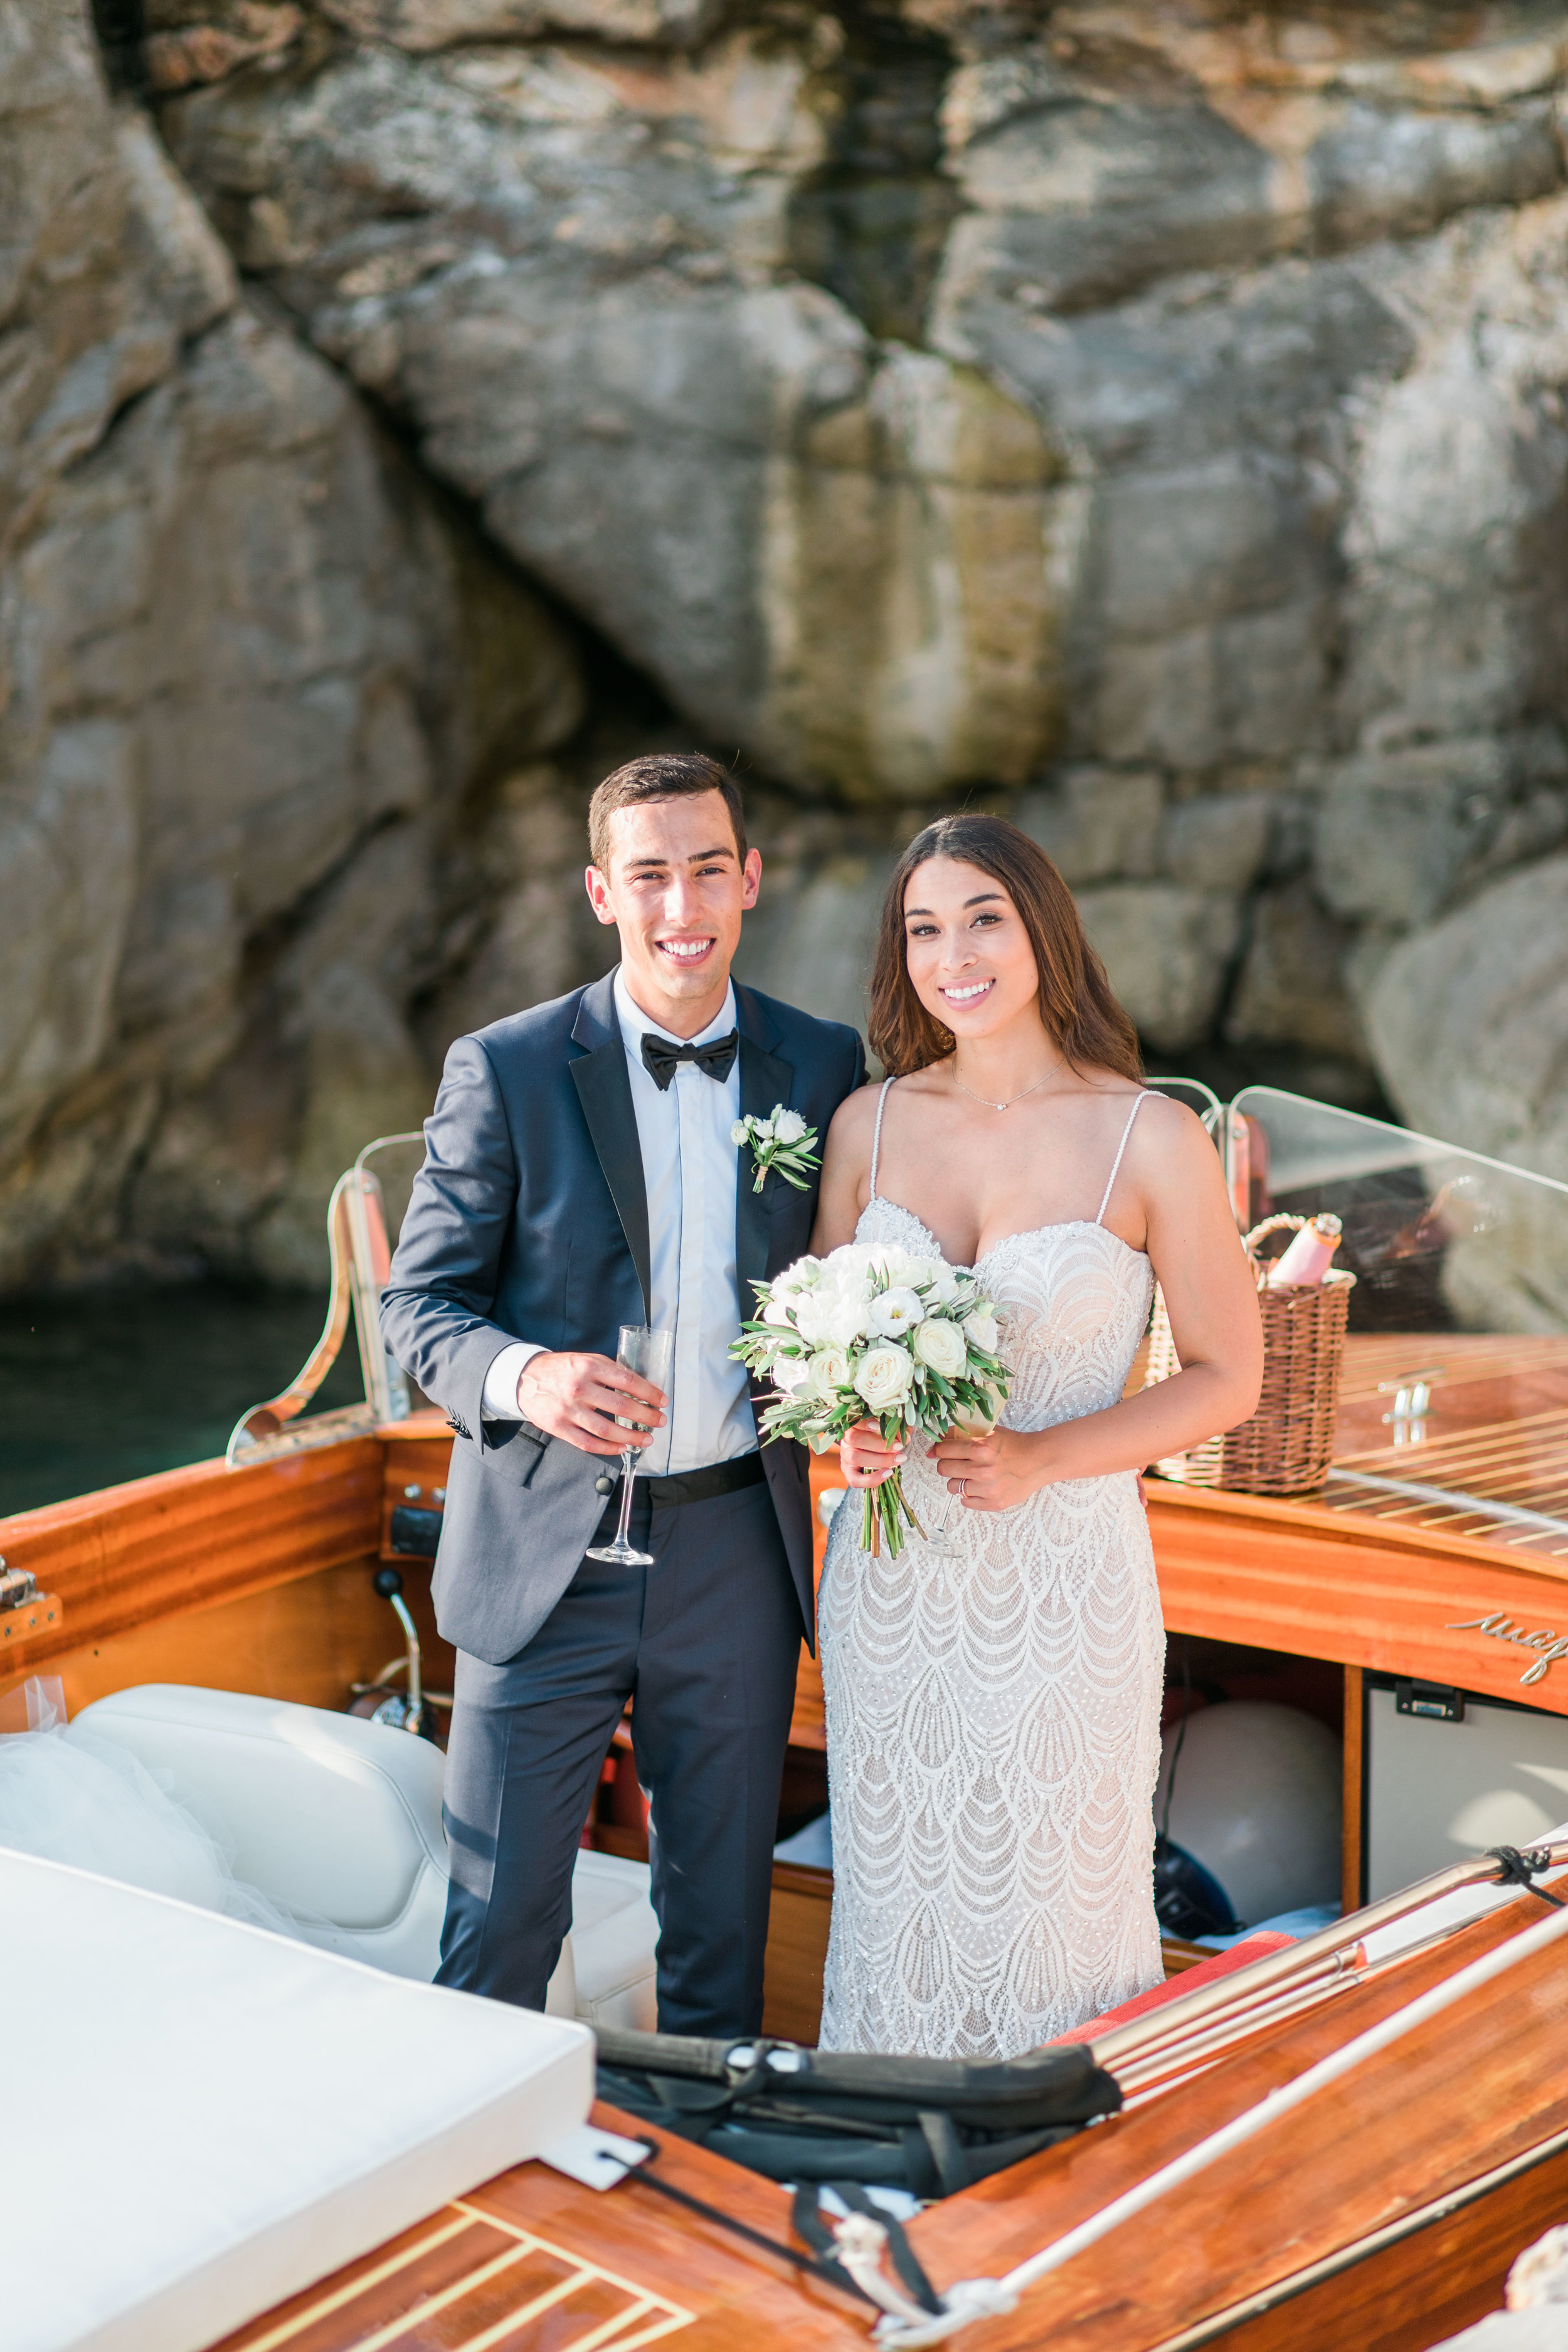 Dubrovnik-Wedding-Photographer-Croatia-Wedding-Photos-JBJ-Pictures-28.jpg